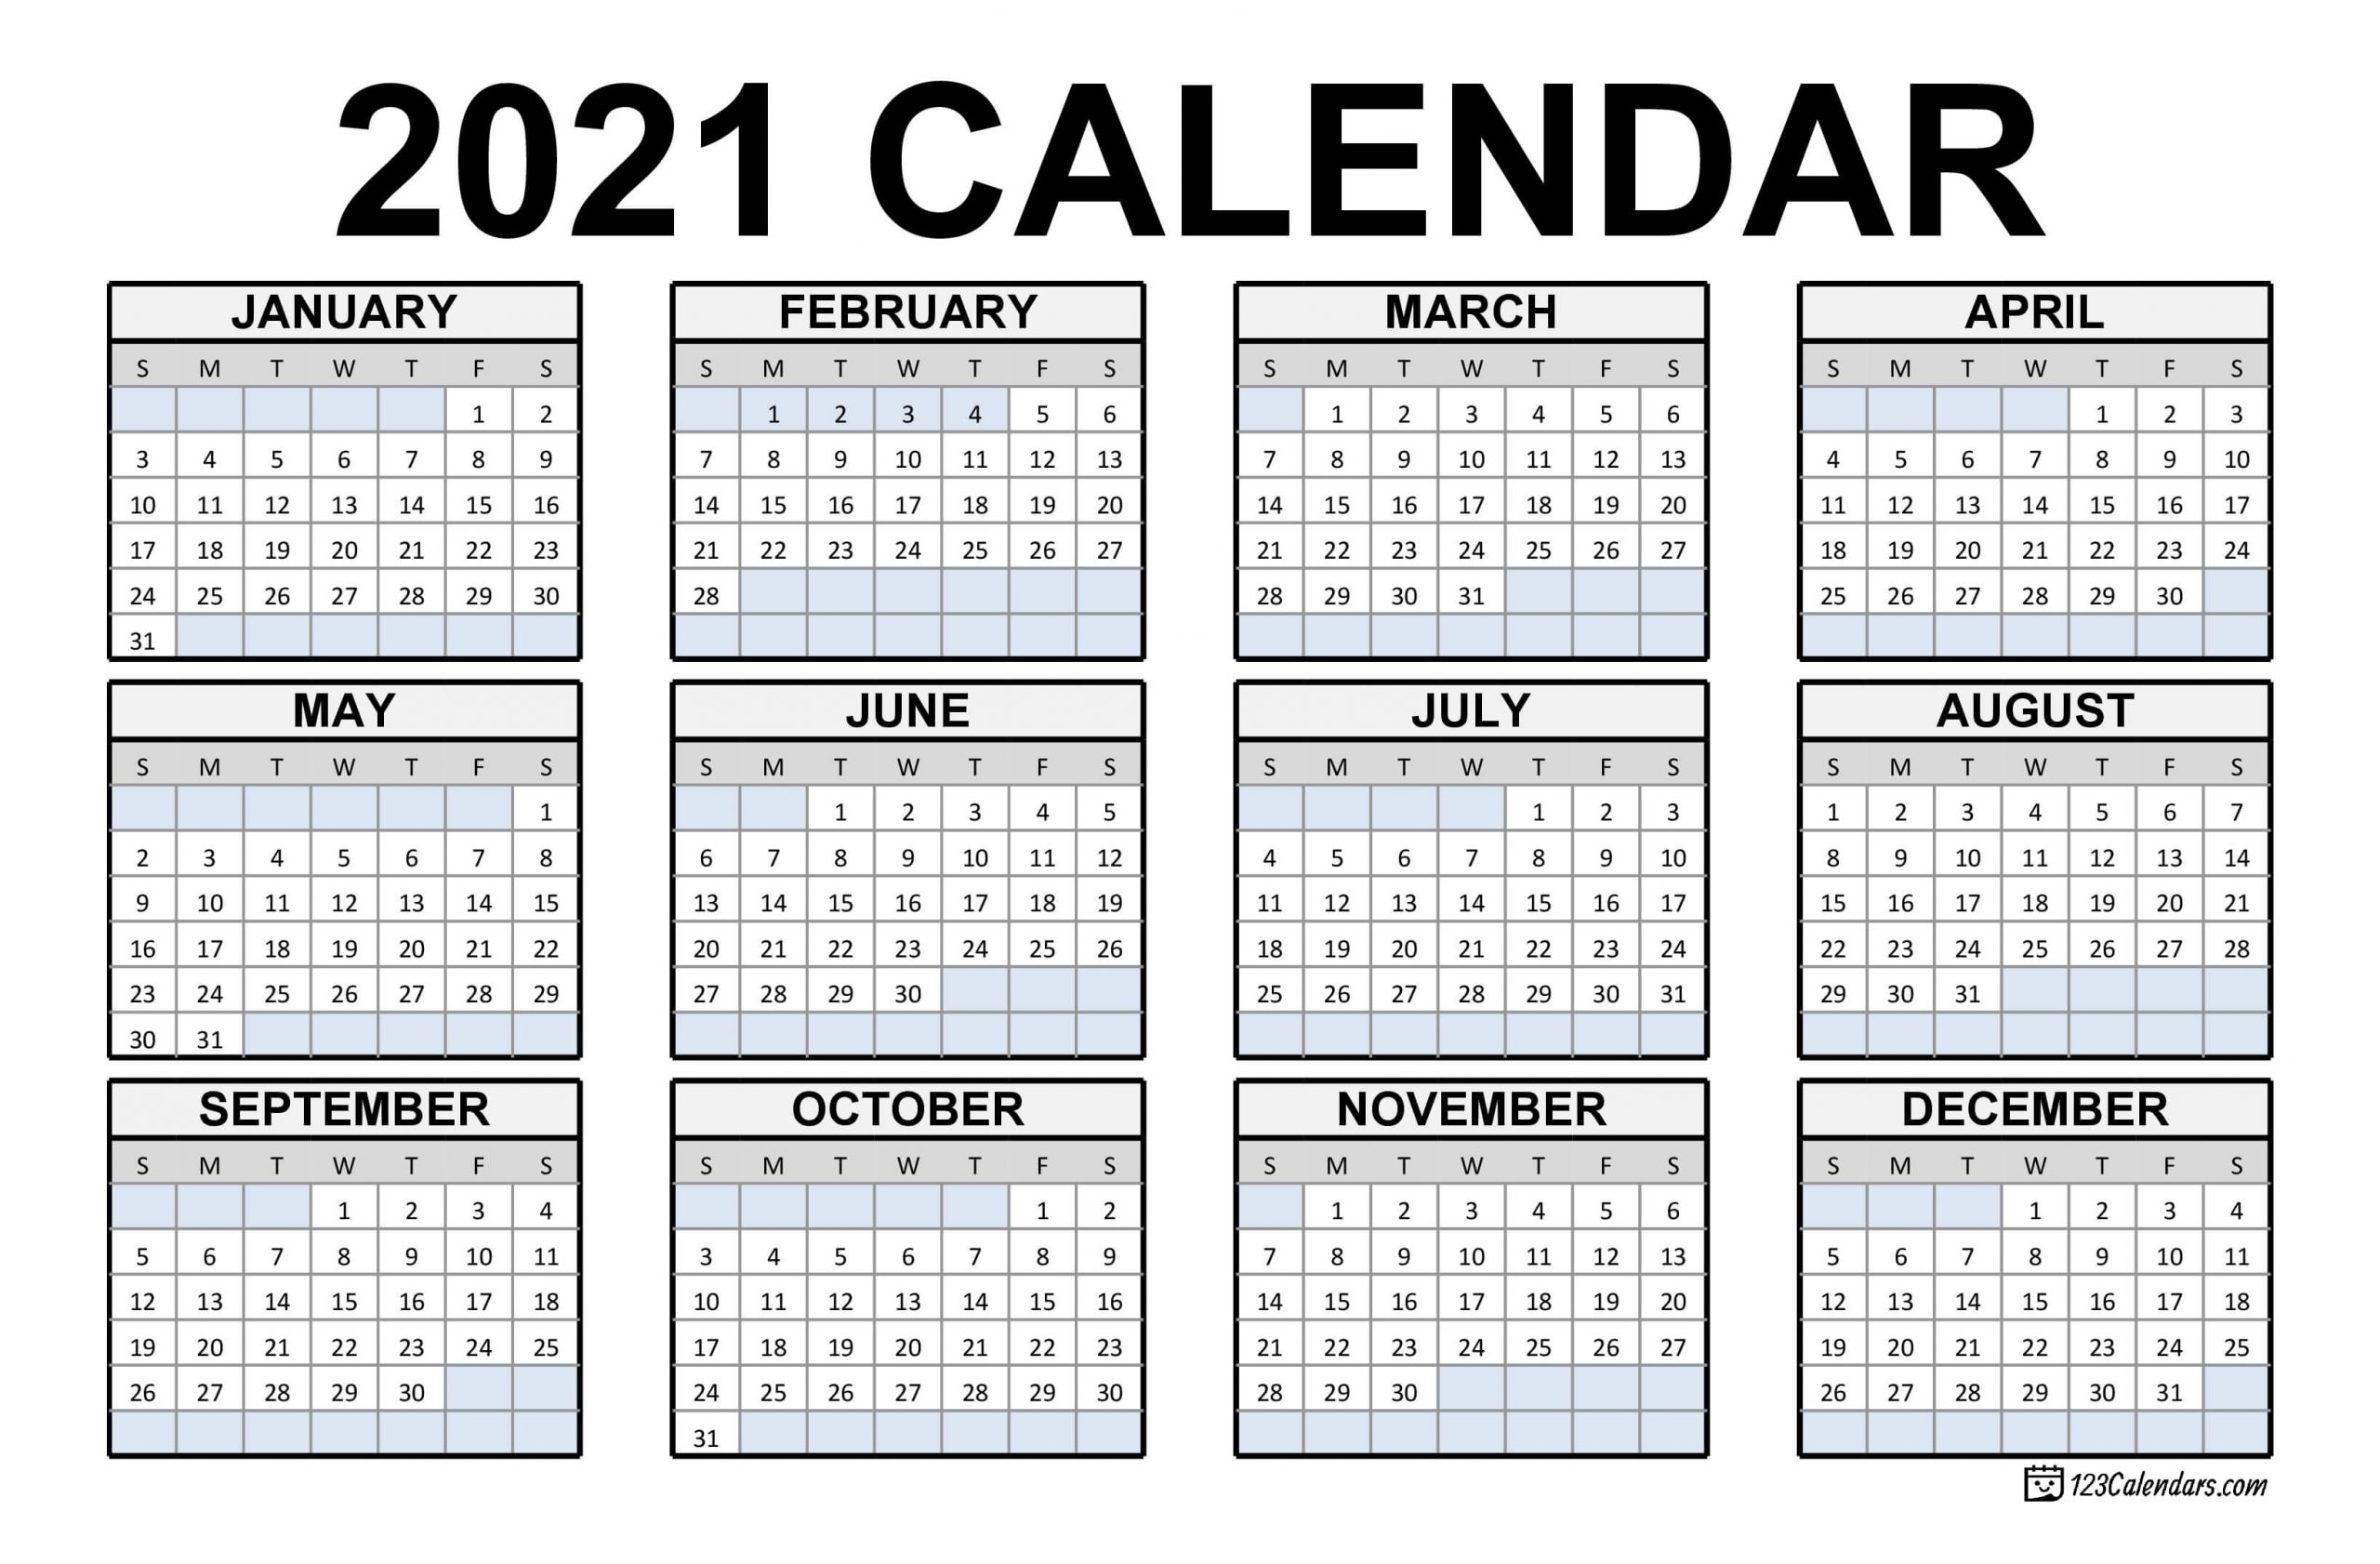 2021 Printable Calendar | 123Calendars for Printable Calendars 2020 Pocket Size